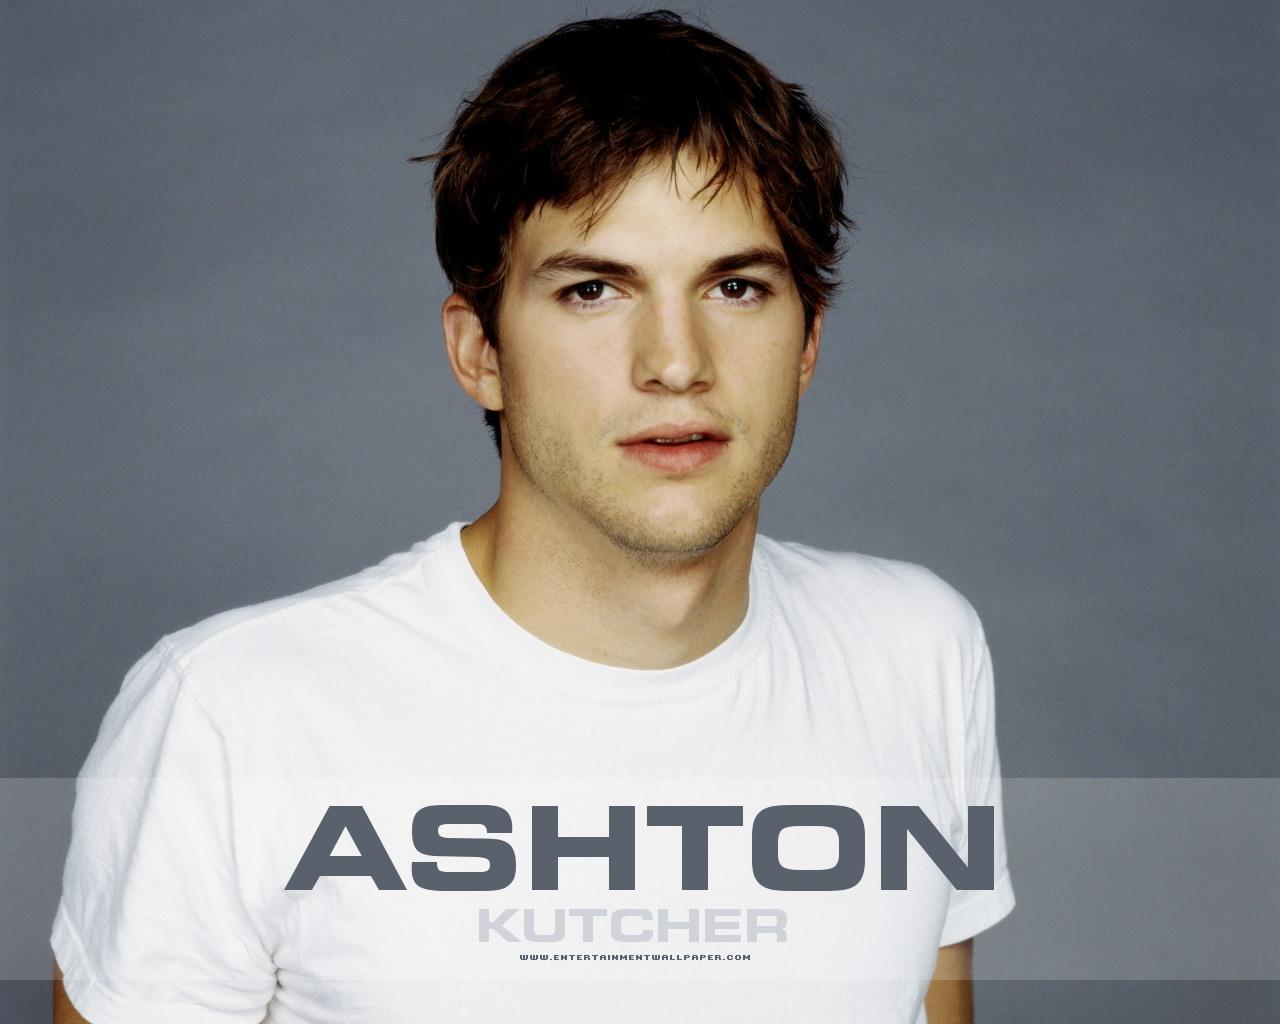 Ashton Kutcher As A Child HD Wallpaper Background Images 1280x1024